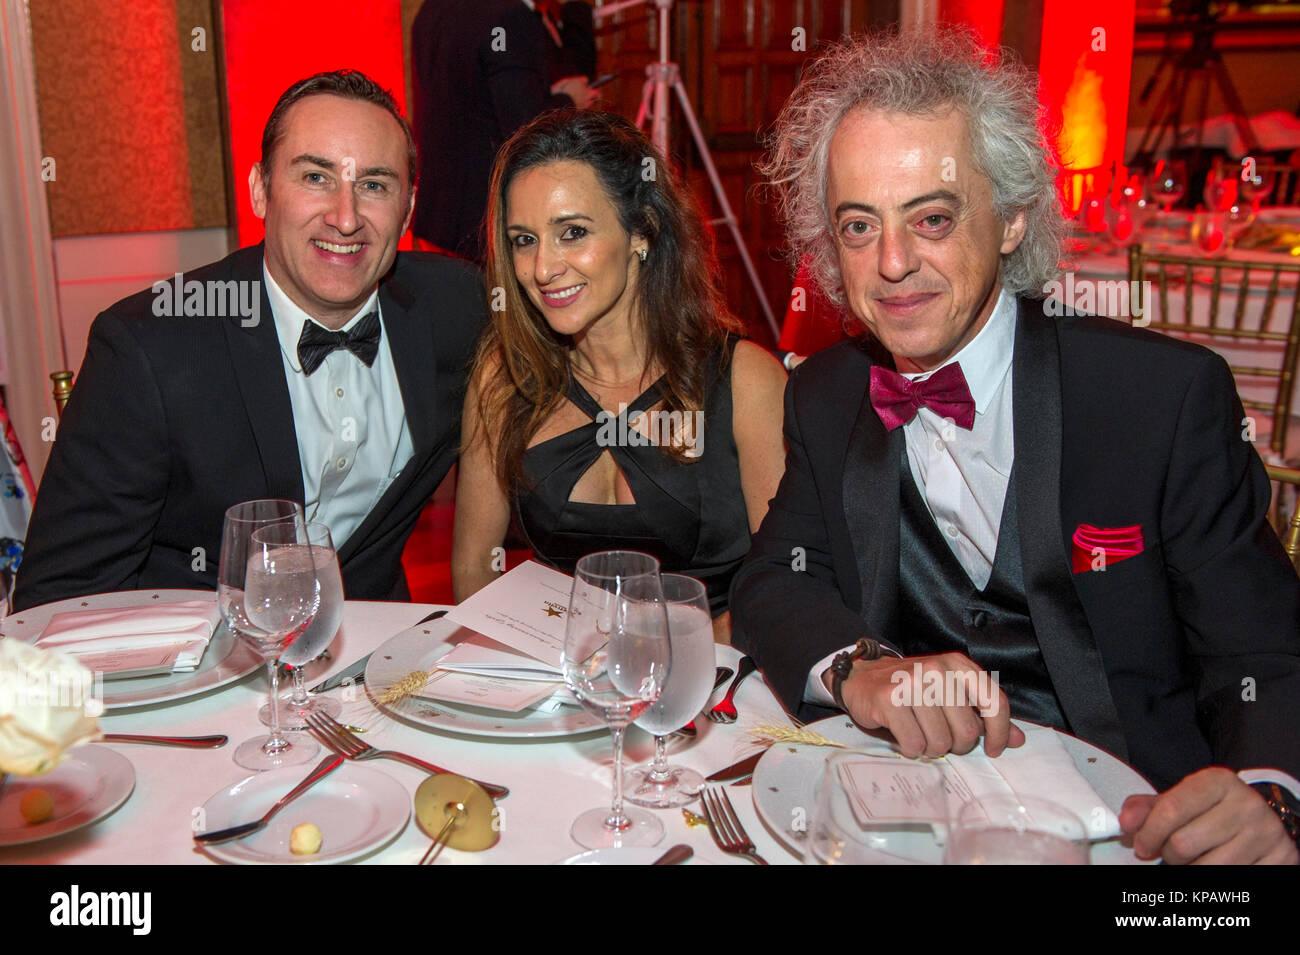 Miami, Estados Unidos. 14th Dec, 2017. The members of the Spanish company Telefonica, Jason Piipo (L), Tania Domínguez - Stock Image